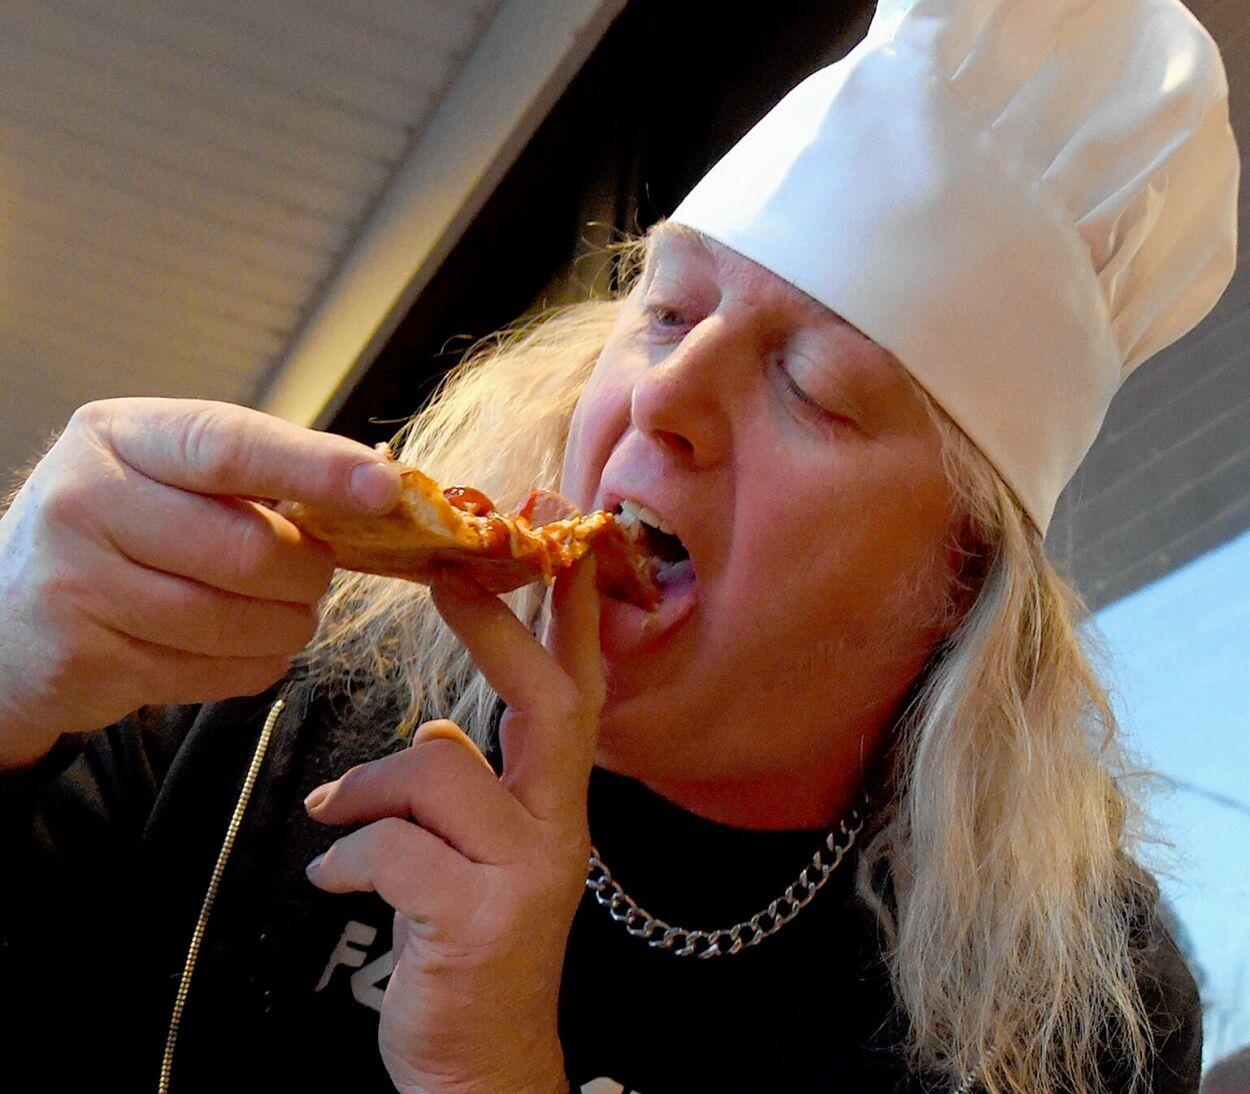 Al Thibodeau tries a slice of his pizza